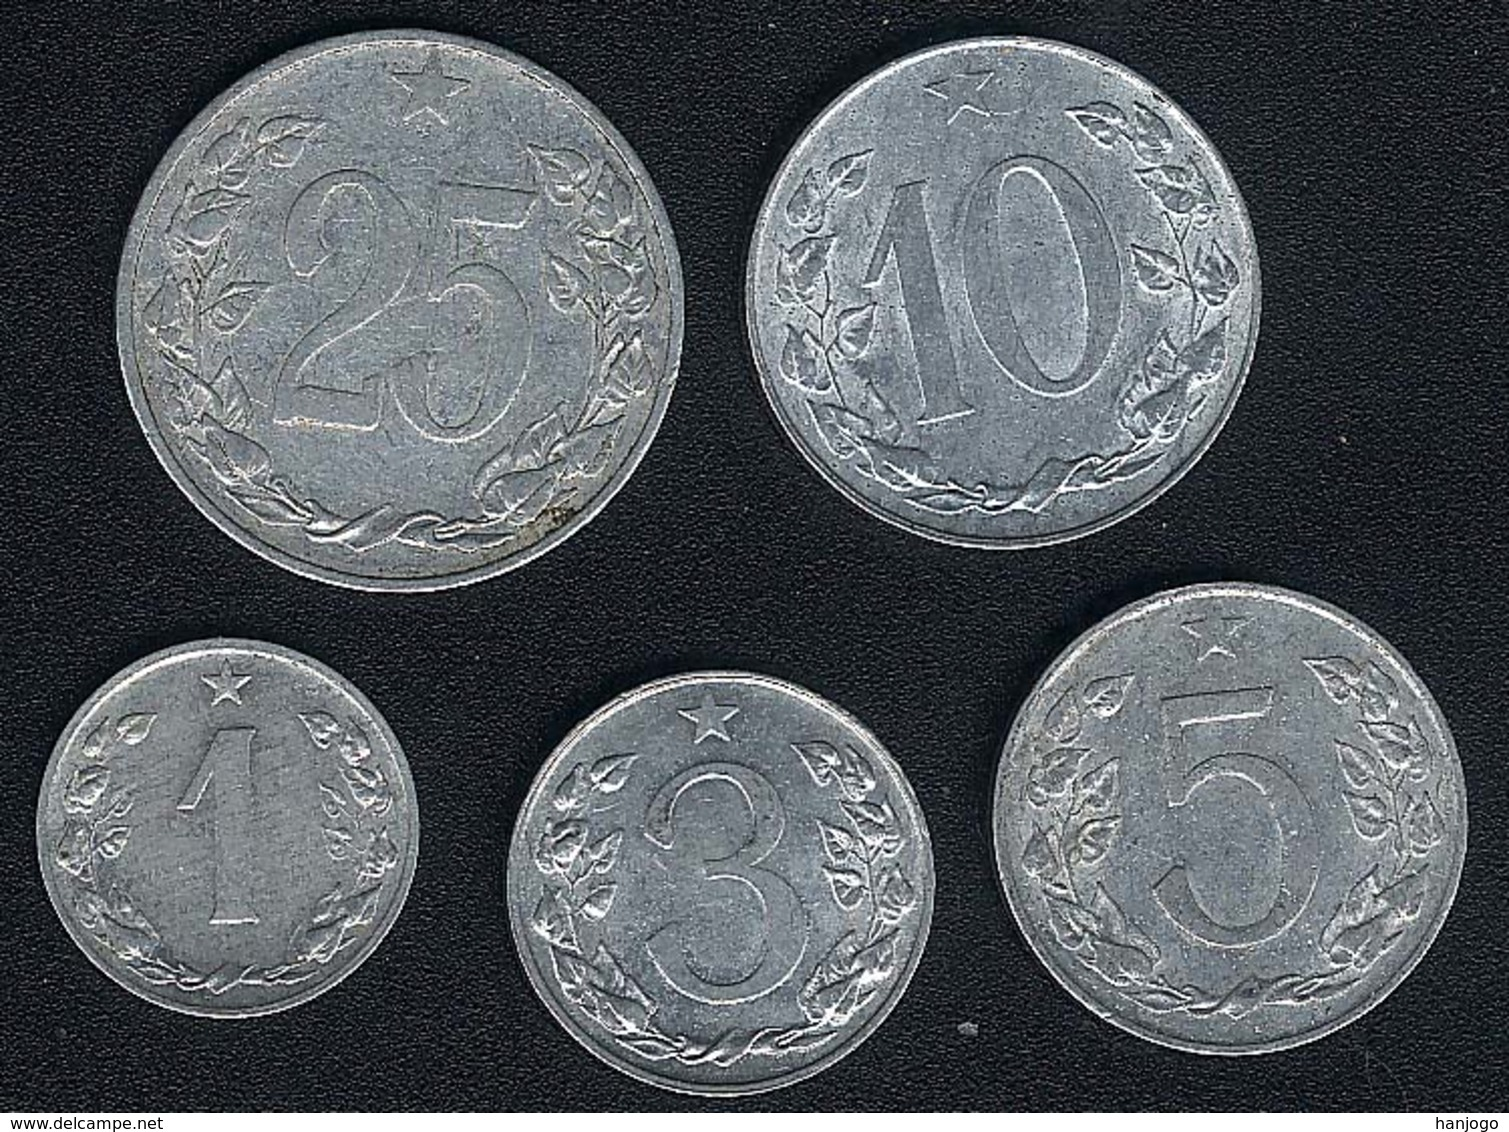 Tschechoslowakei, Lot 1+3+5+10+25 Haler(u), 1953-1958 - Tschechoslowakei